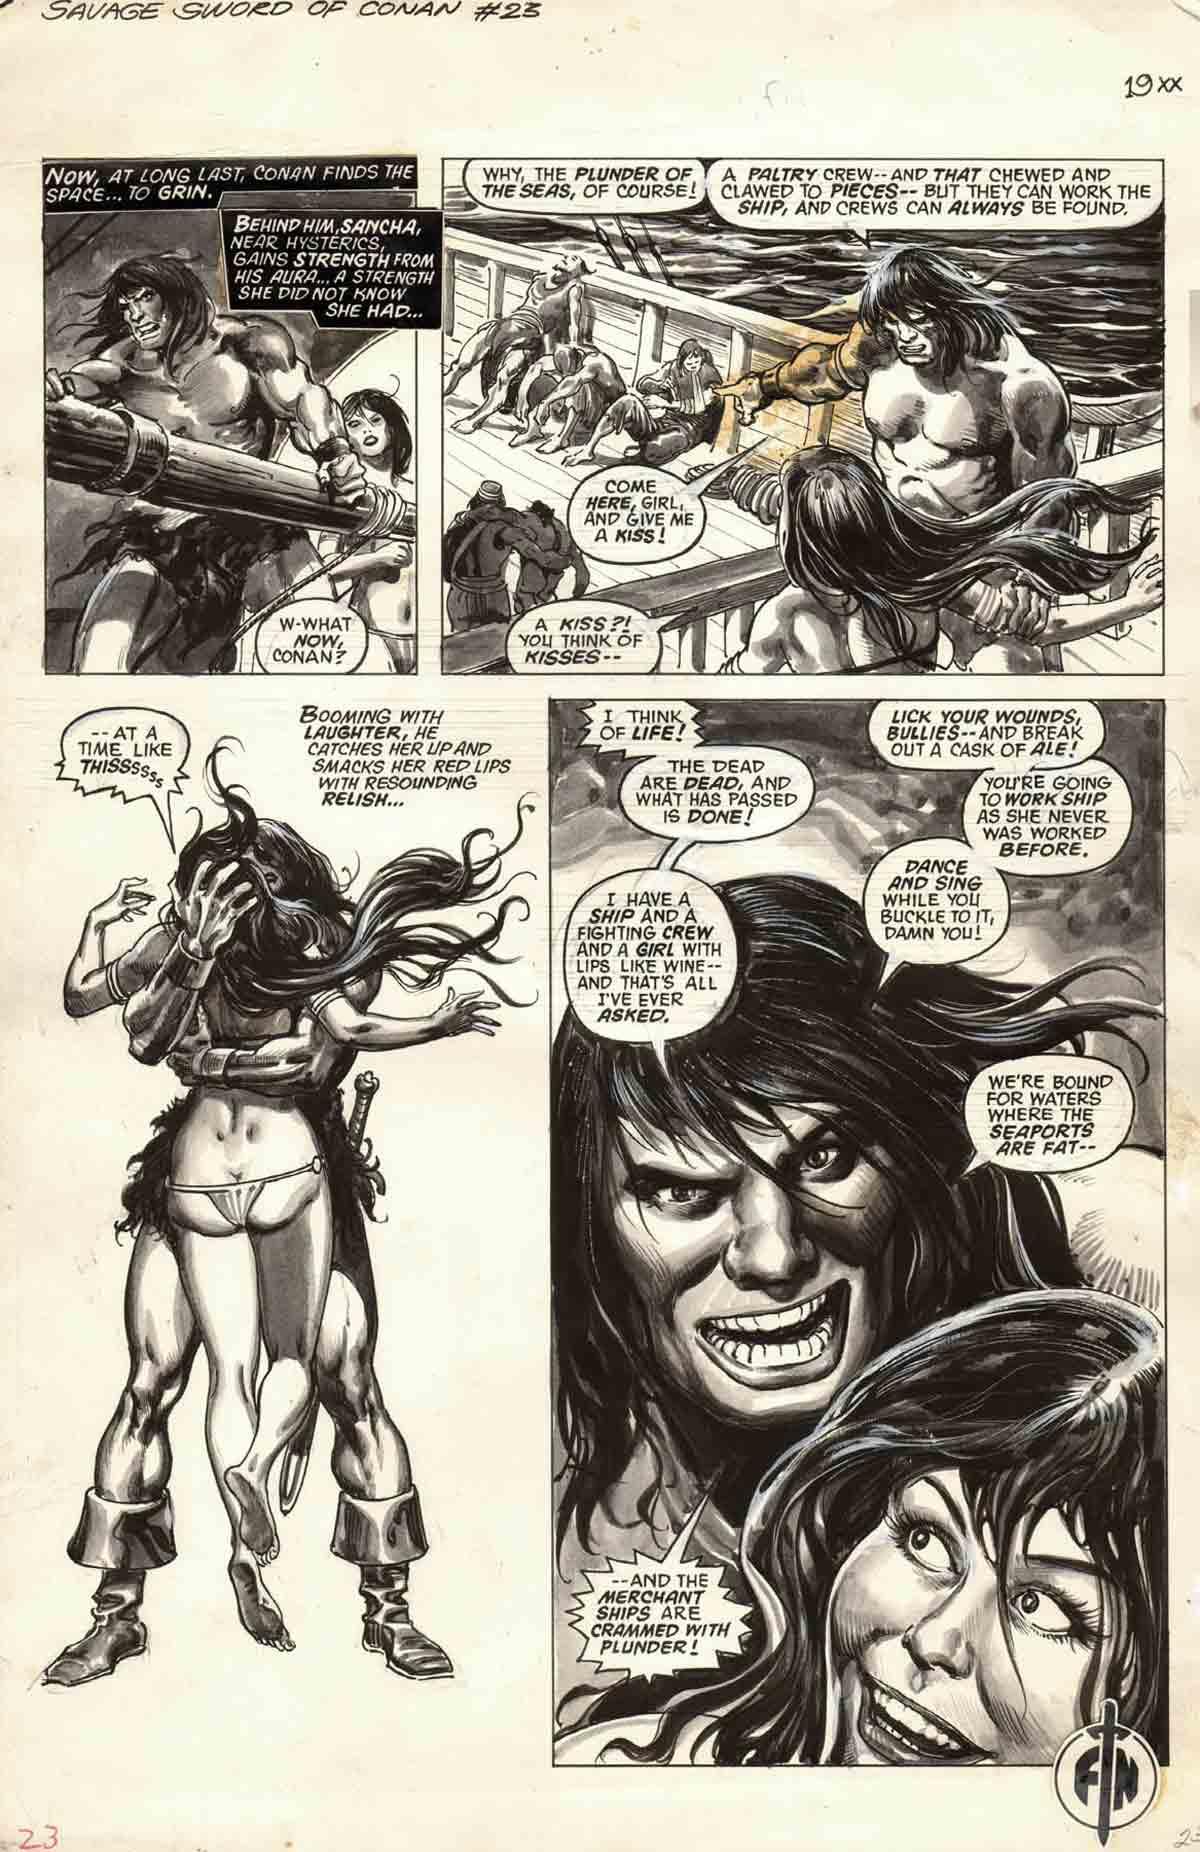 Golem-Comics-La-espada-salvaje-de-conan-el-barbaro-la-llegada-de-conan-03